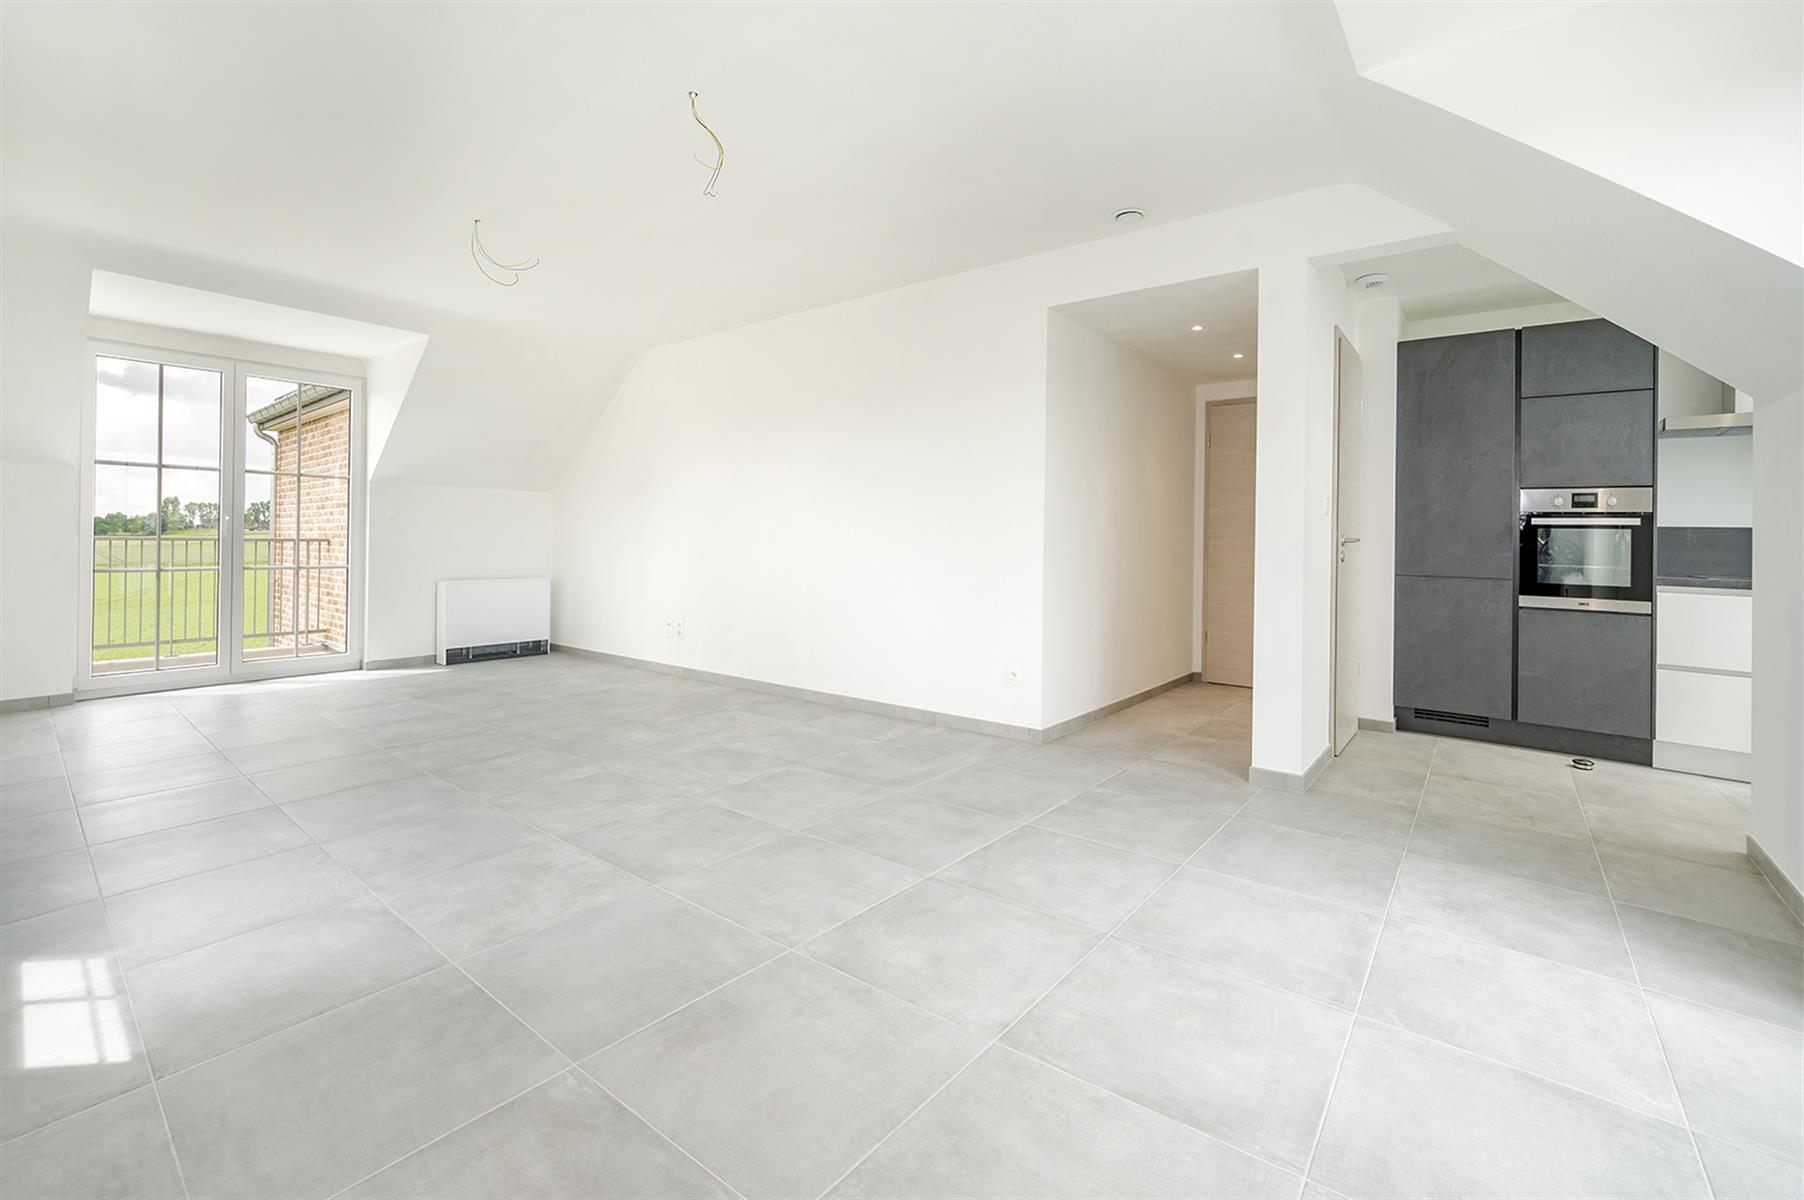 Appartement avec jardin - Huy - #3807237-6